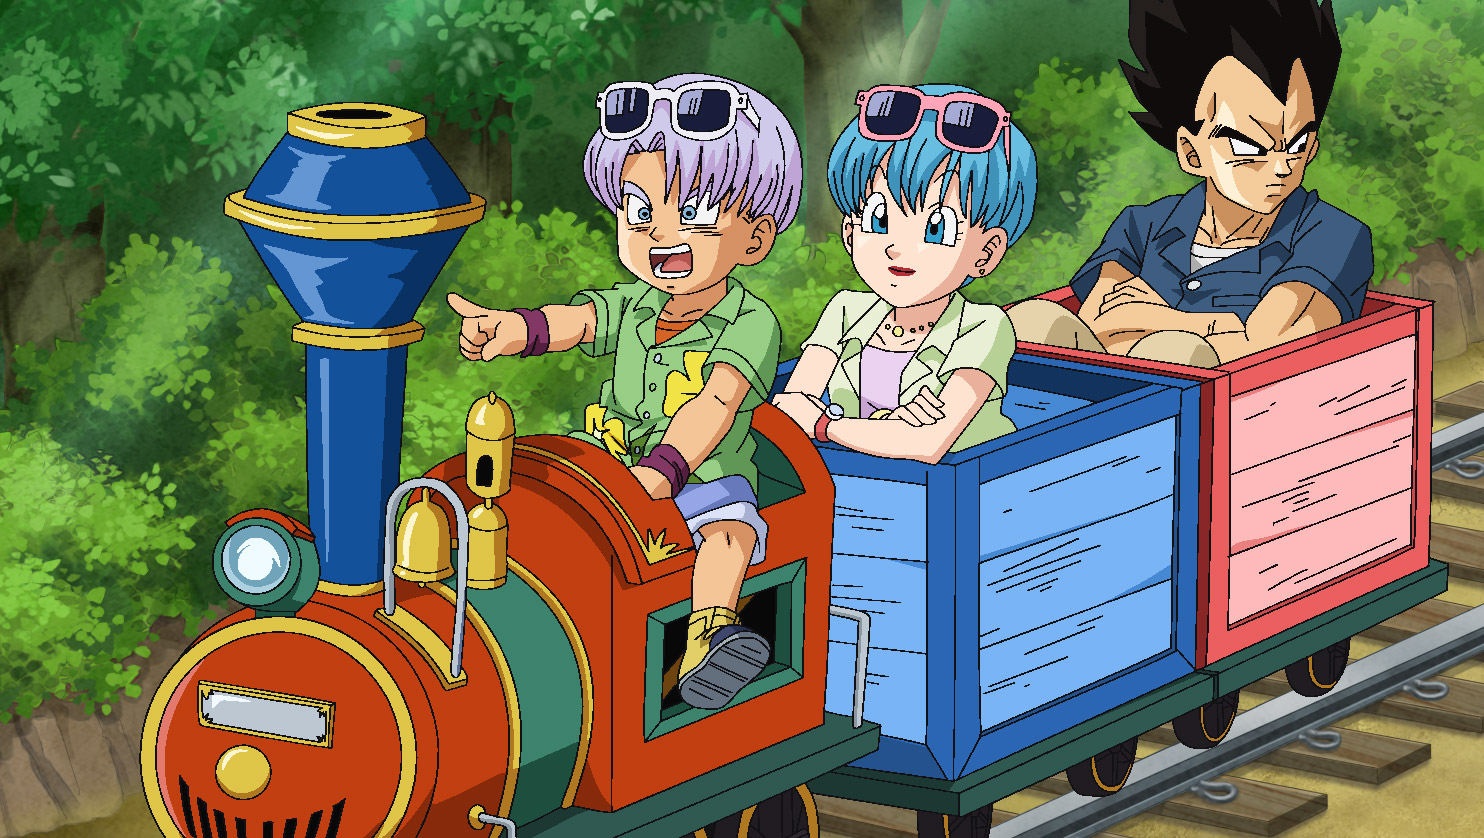 Dragon Ball Super Ep 01 Sub Ita streaming